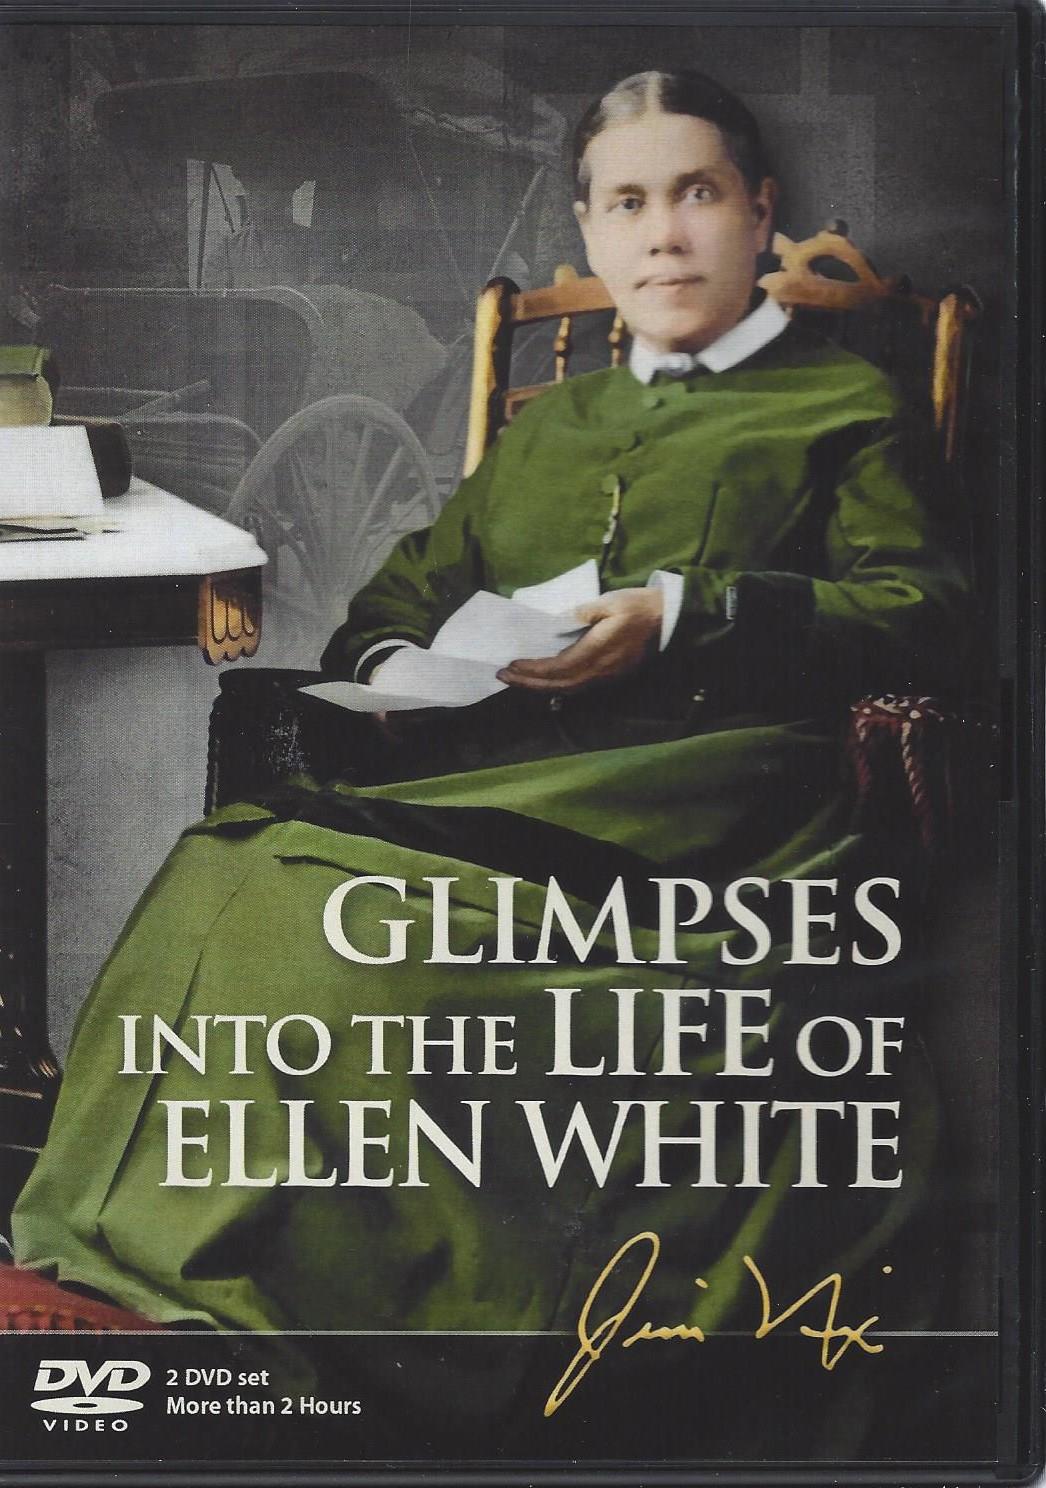 Glimpses into the Life of Ellen White DVD